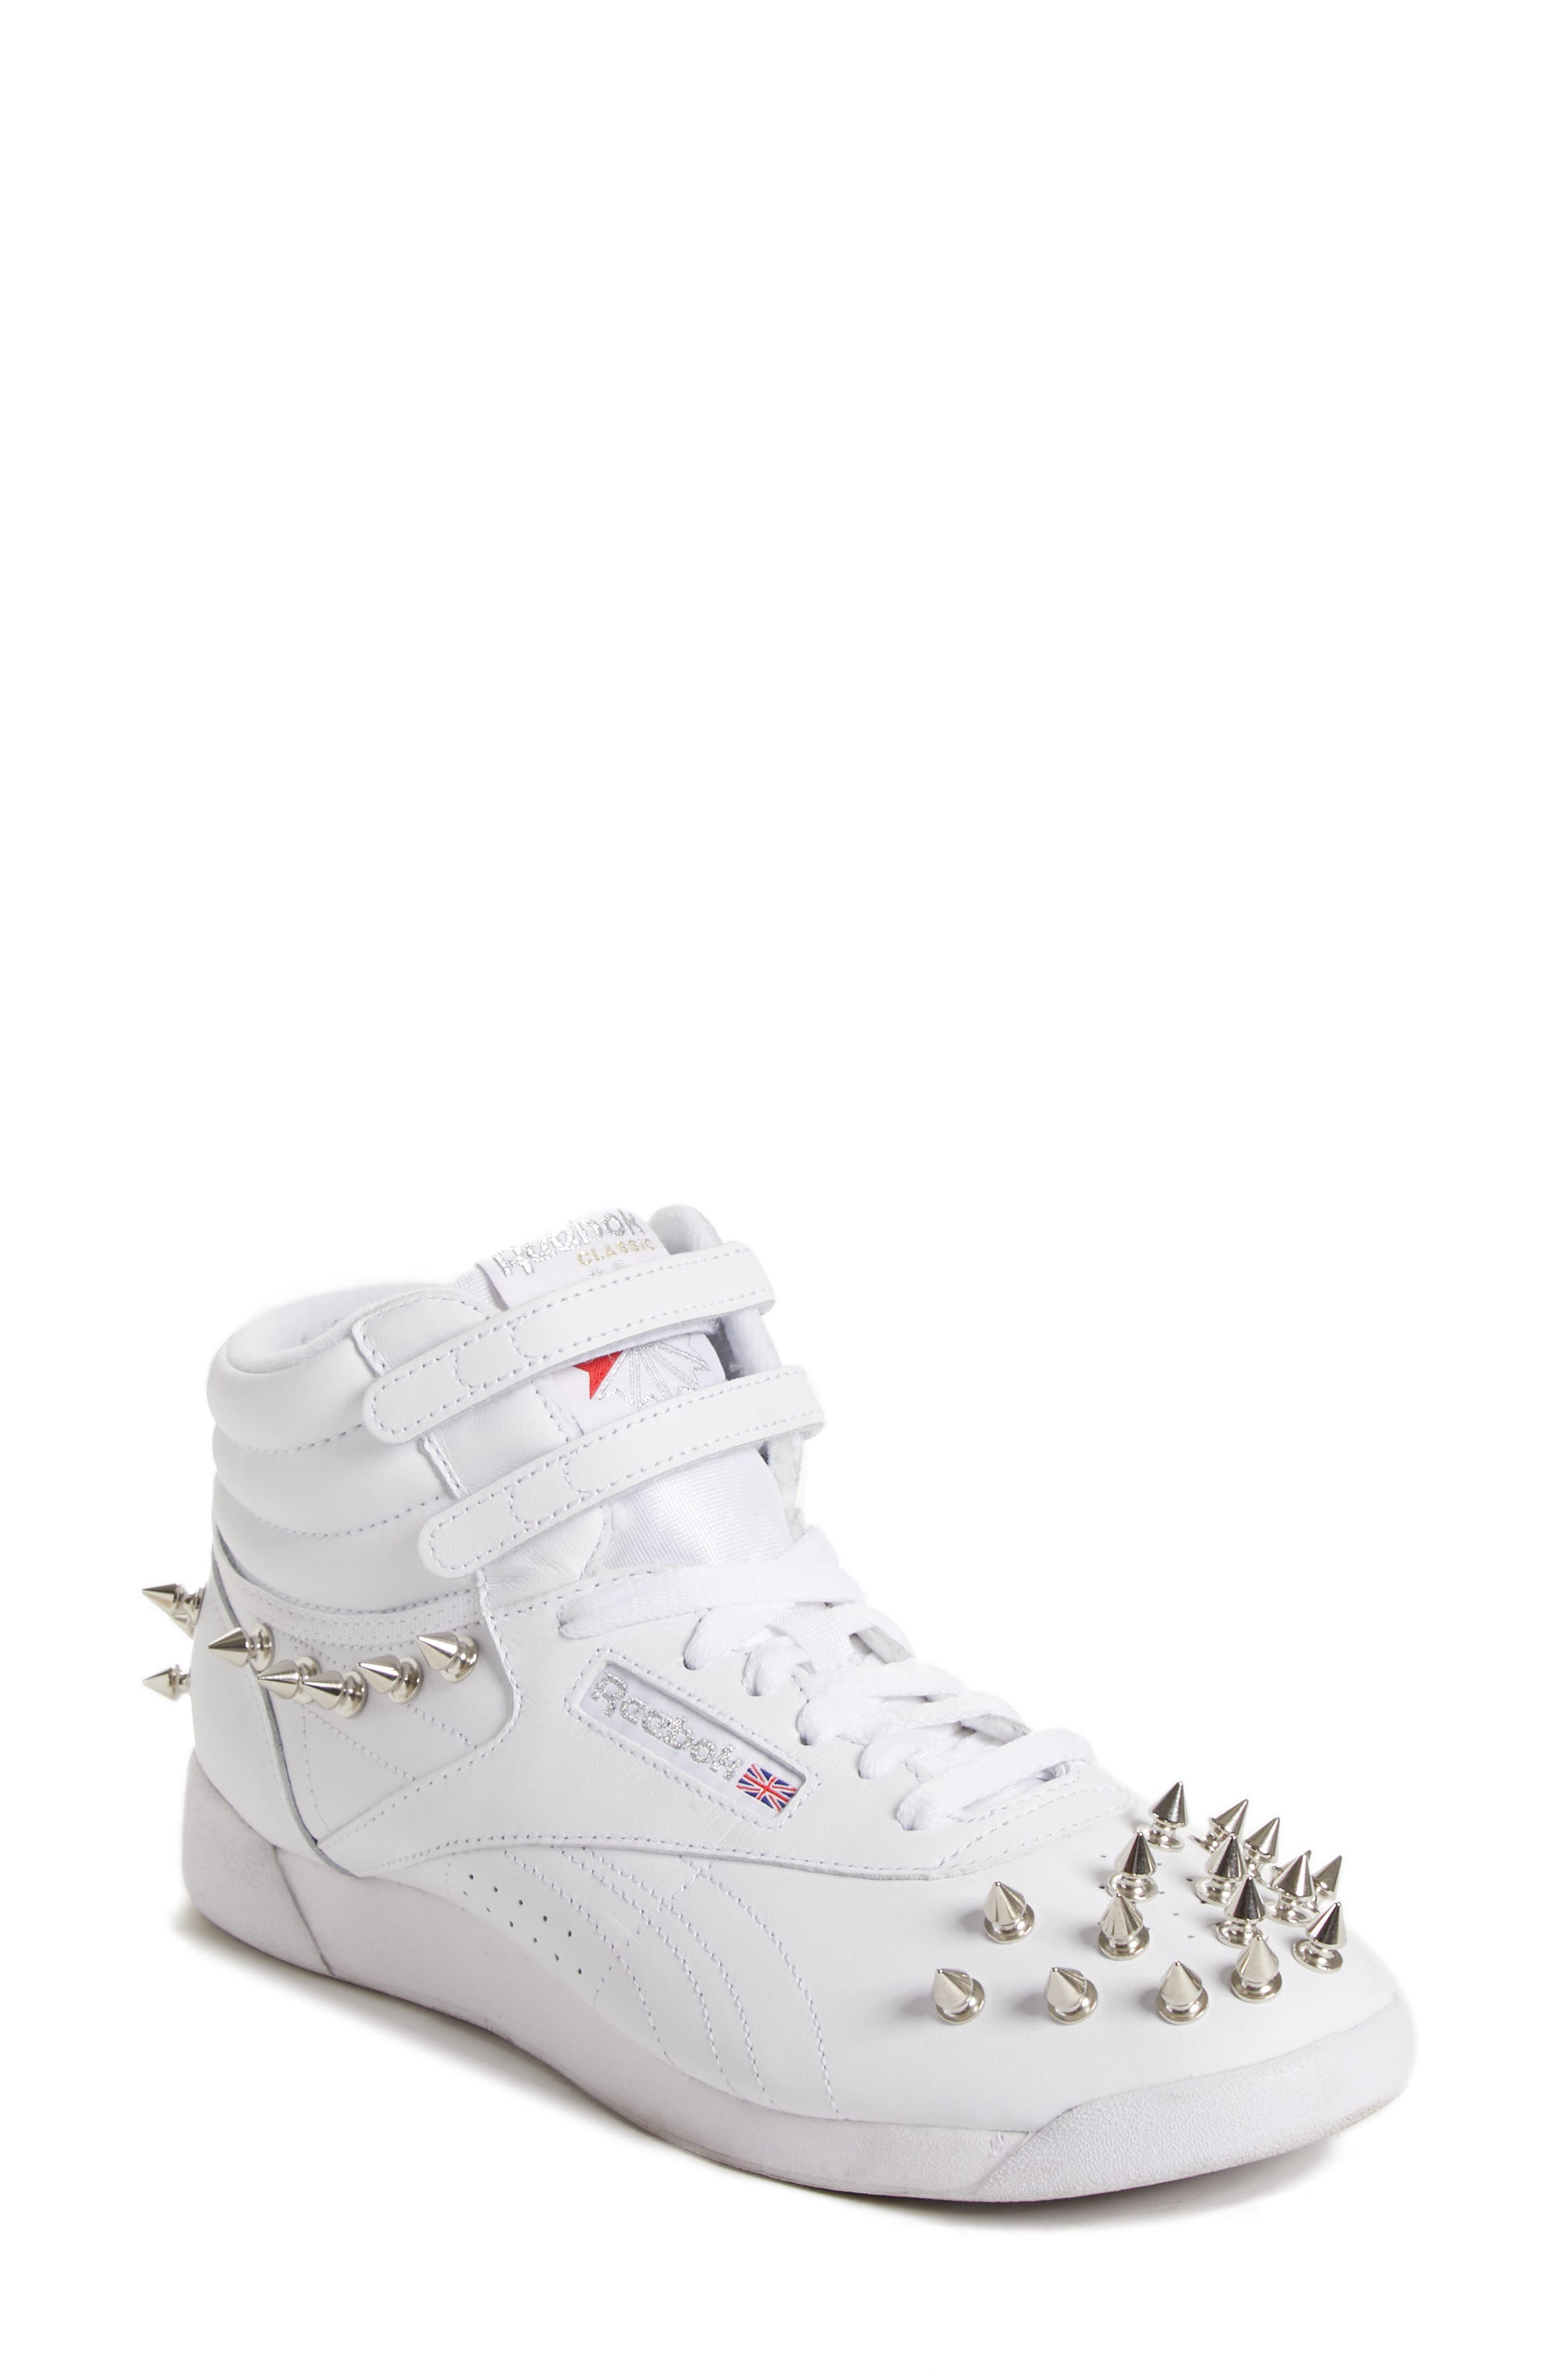 x Reebok Studded Sneaker,                         Main,                         color, WHITE